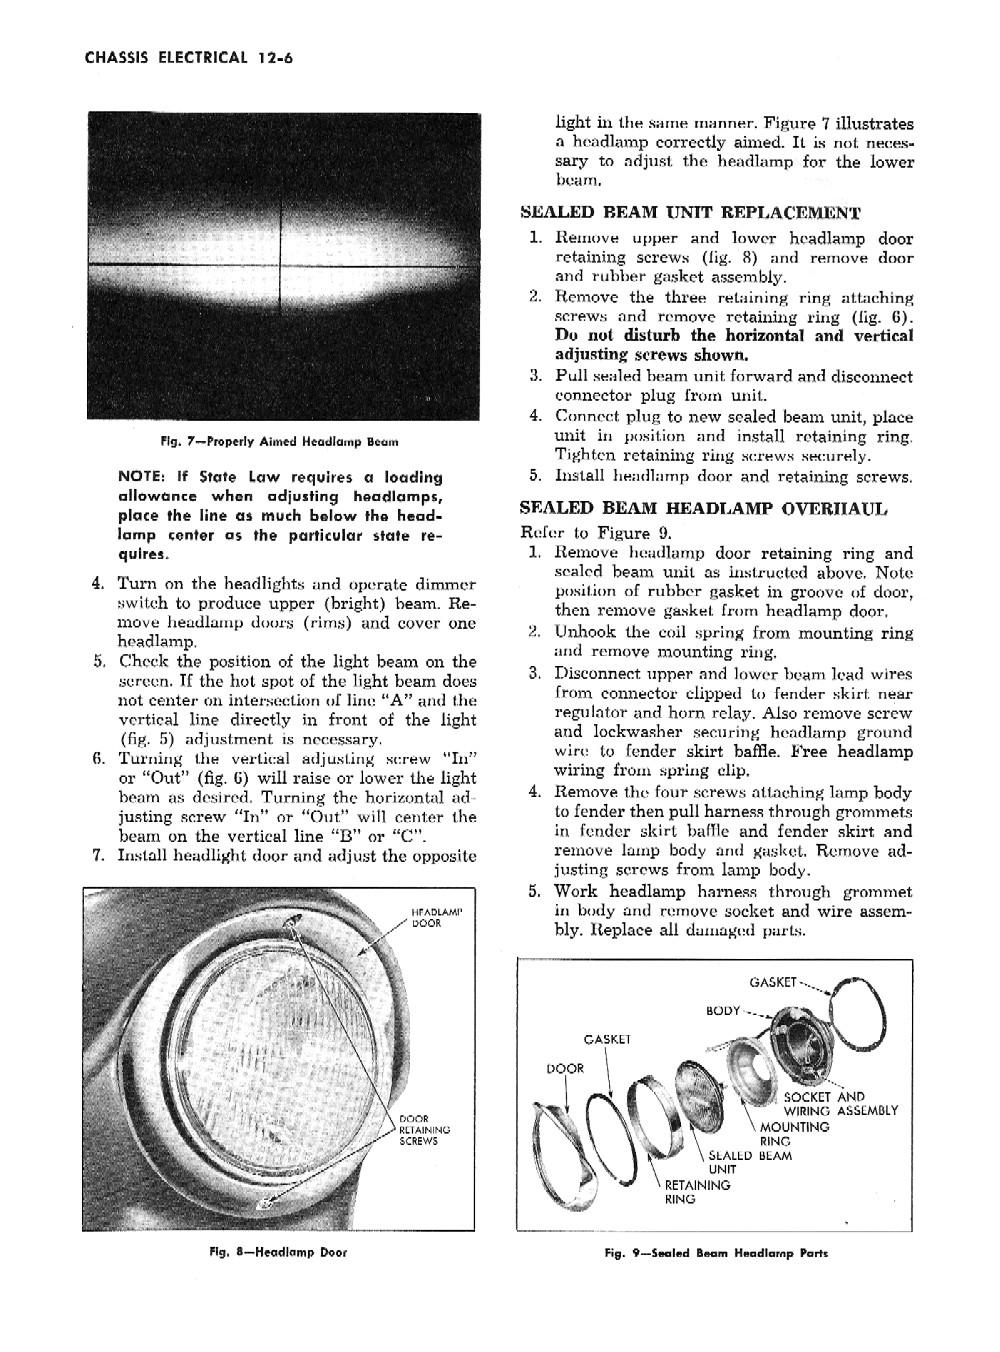 55 Chevy Headlight Retaining Ring *NEW* 1955 Chevrolet